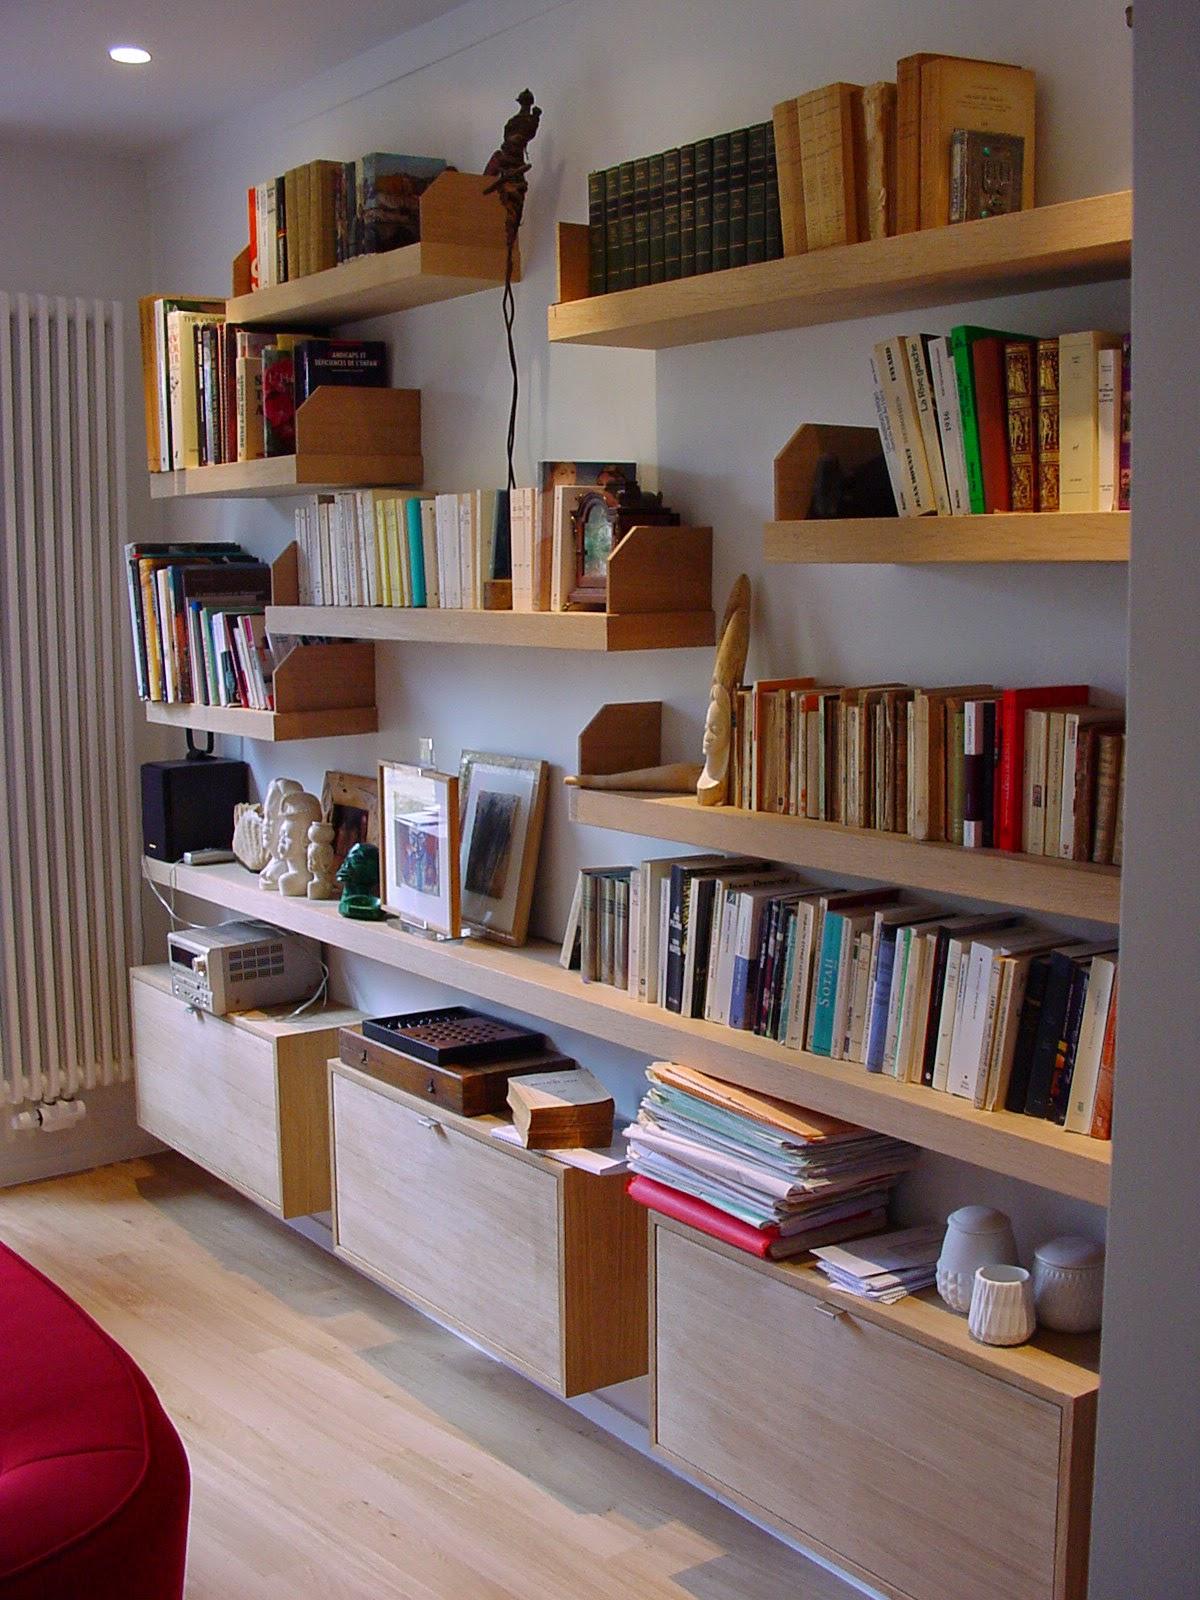 bois formes espaces biblioth que contemporaine contemporary bookcase. Black Bedroom Furniture Sets. Home Design Ideas